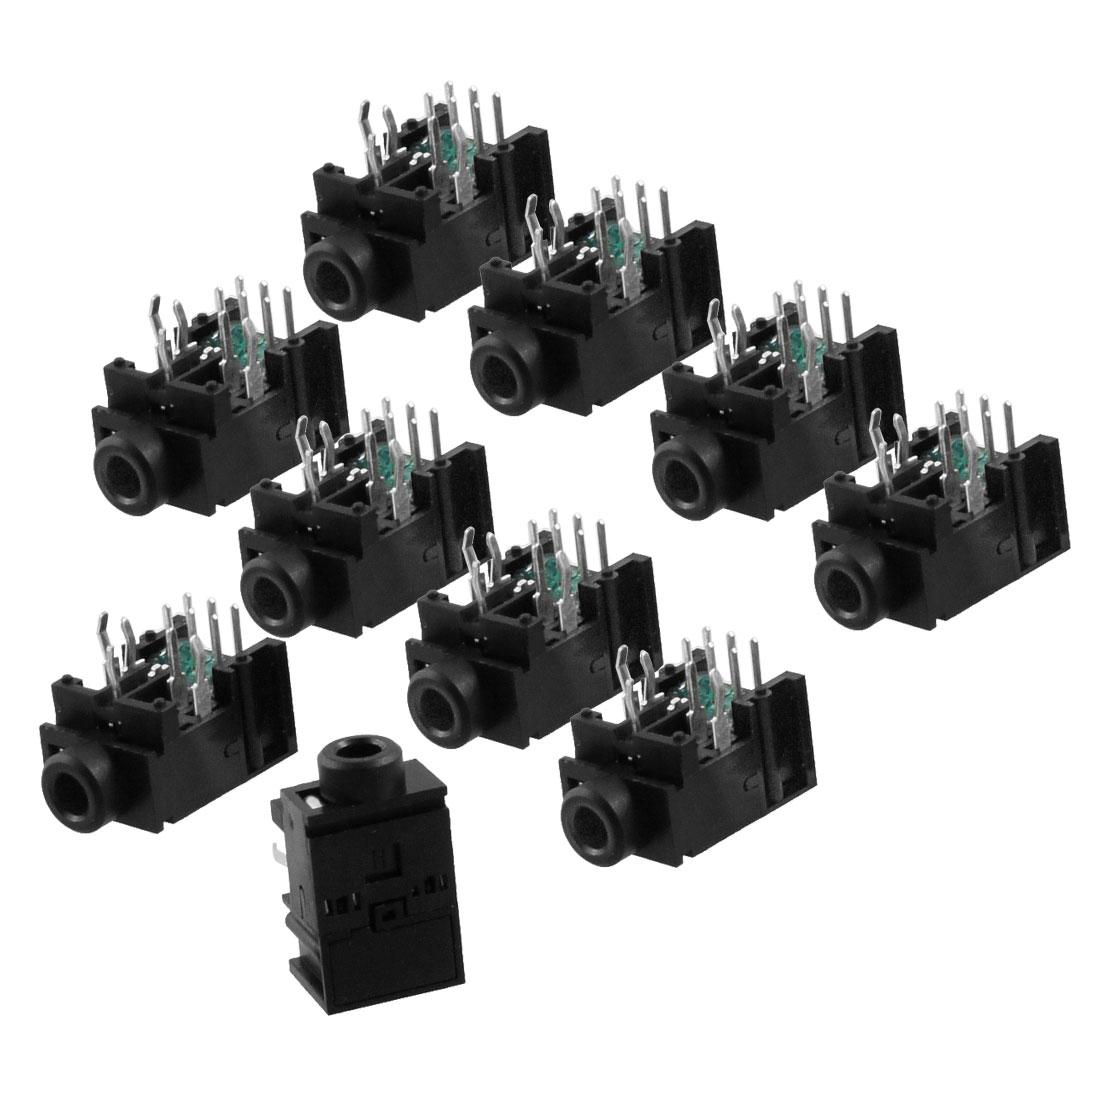 10 x 11 Pins PCB Female 3.5mm Stereo Headphone Jack Socket Connector